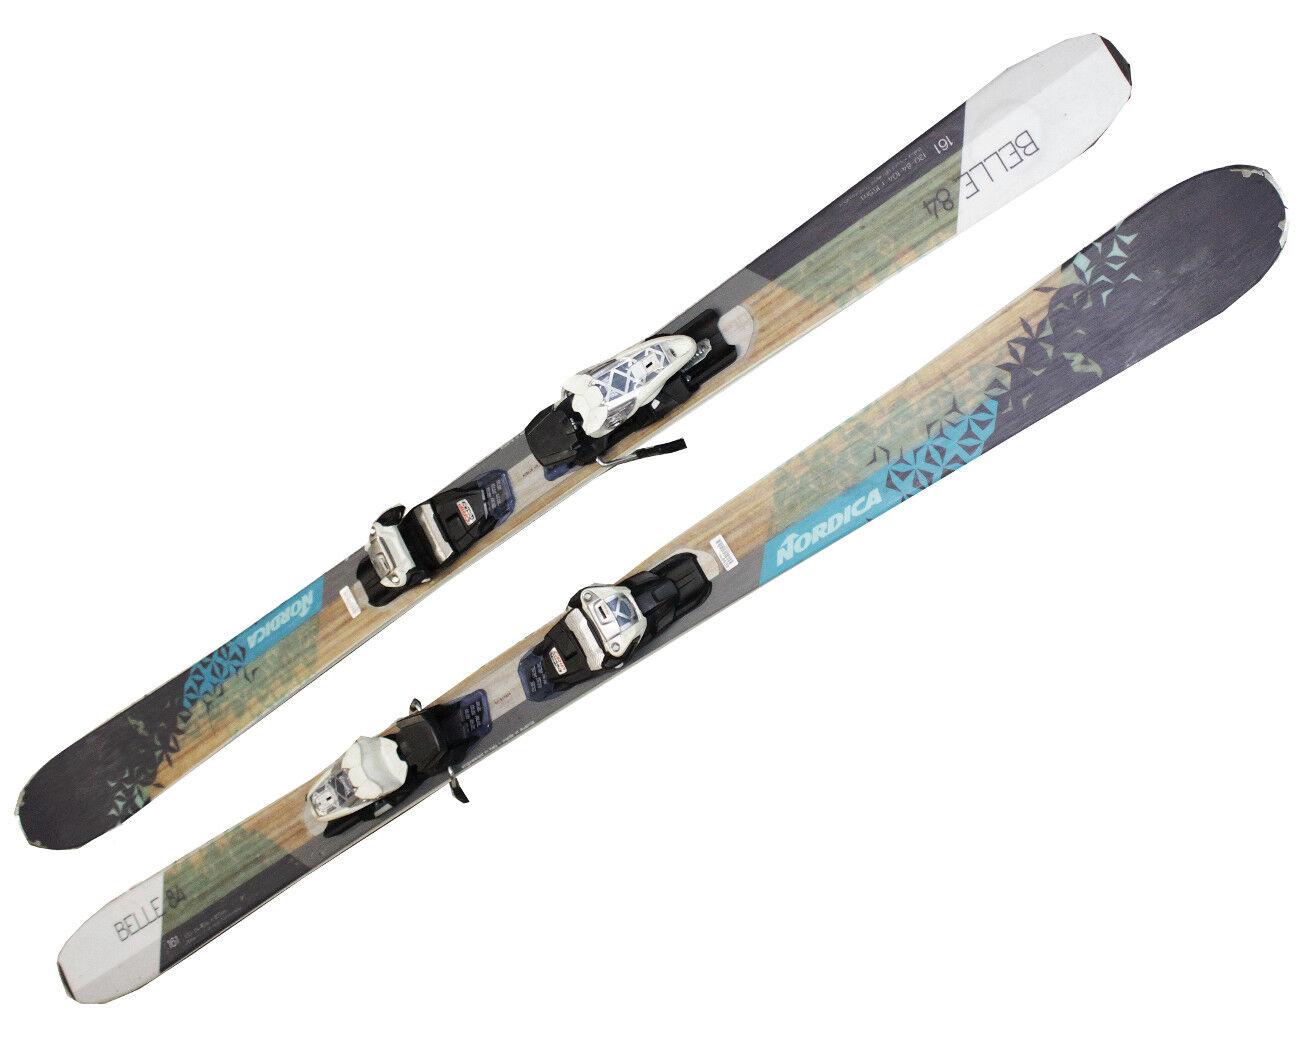 åka skidor Nordica Belle 84 tescki 169 161 cm kvinnoråka skidor 16 17 Marker Leads X17